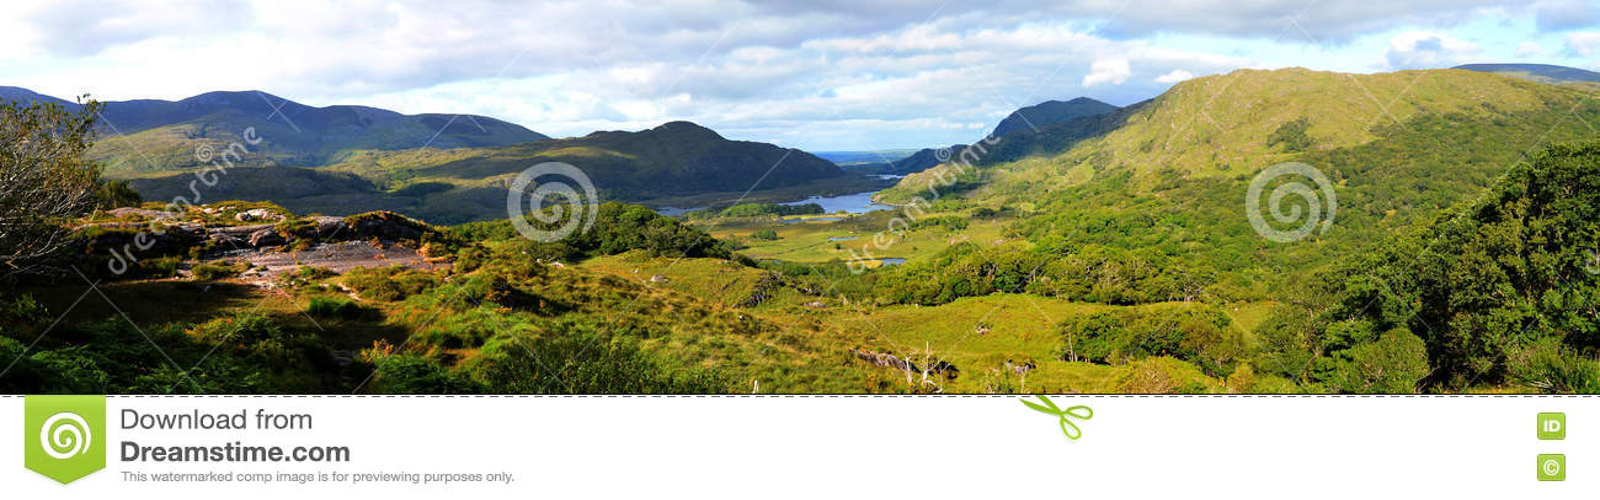 Panorama do vale de Killarney